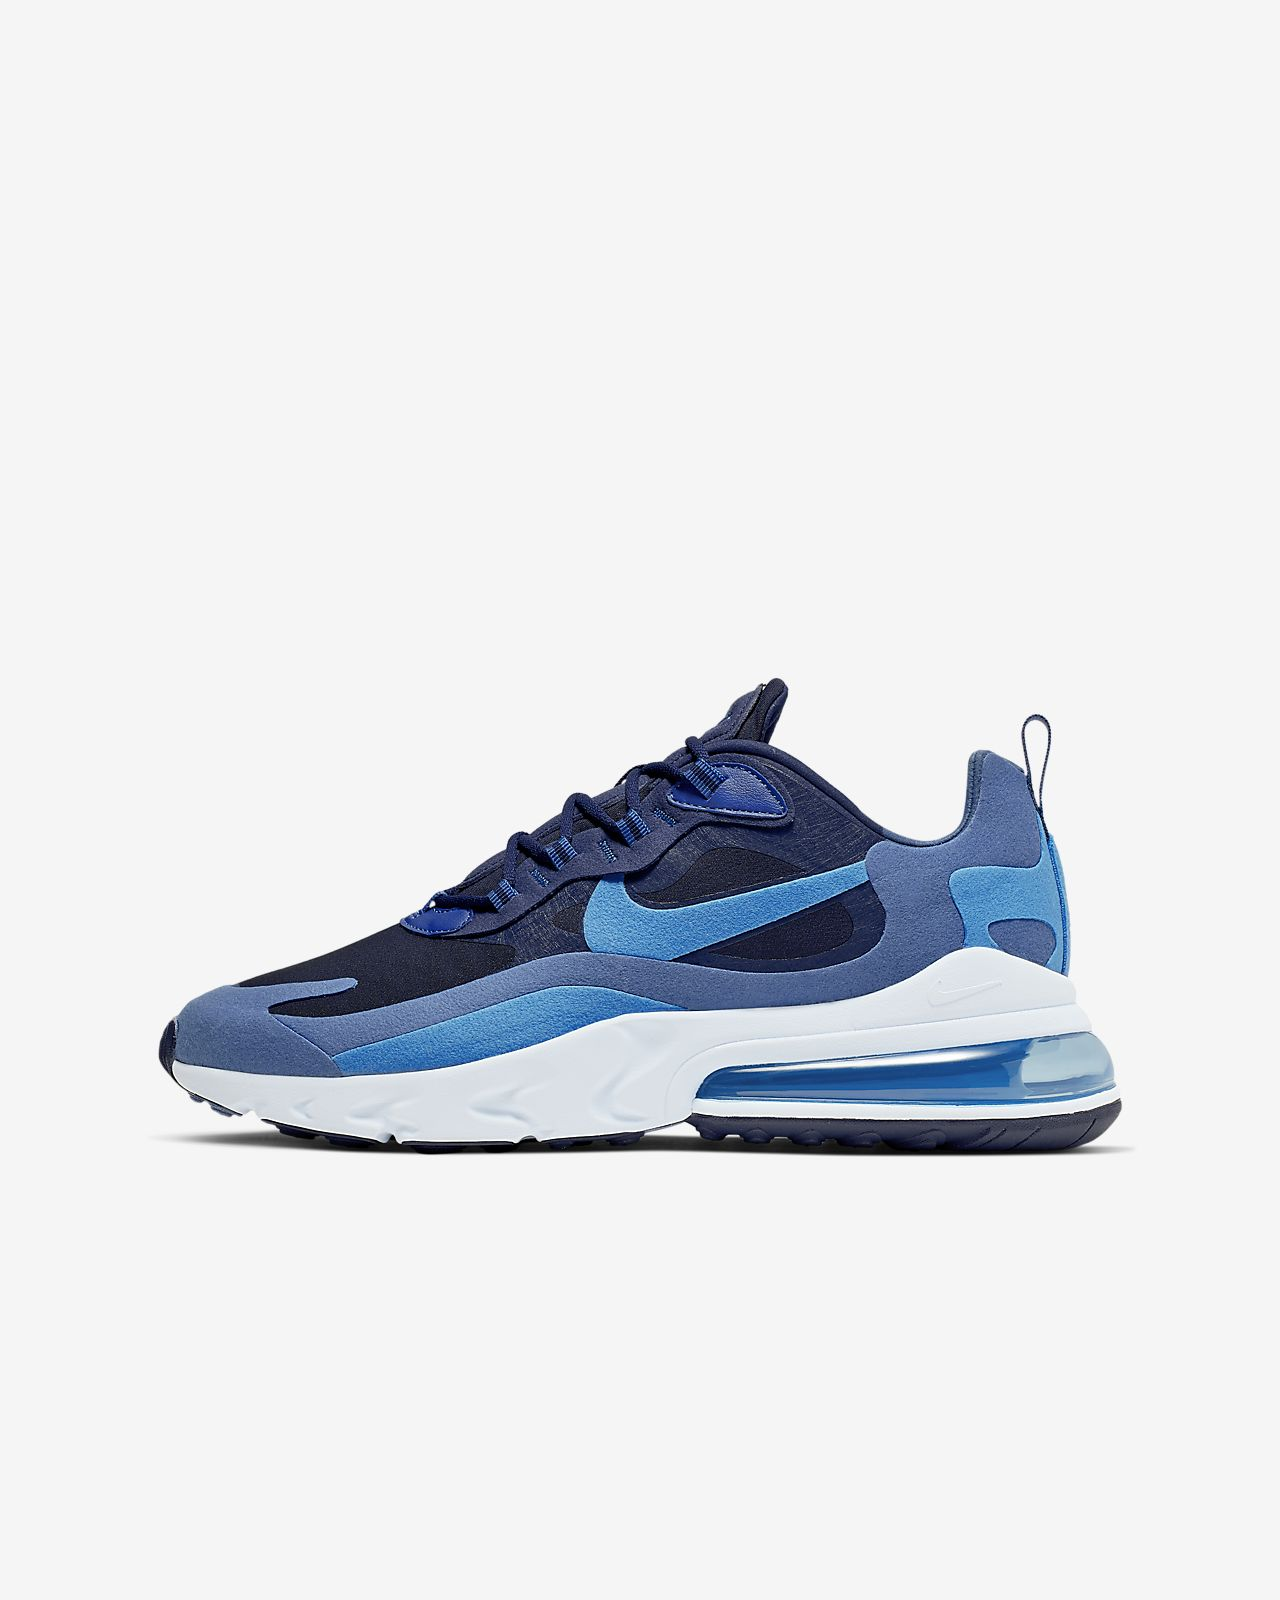 Nike Air Max 270 React (Impressionism Art) Erkek Ayakkabısı